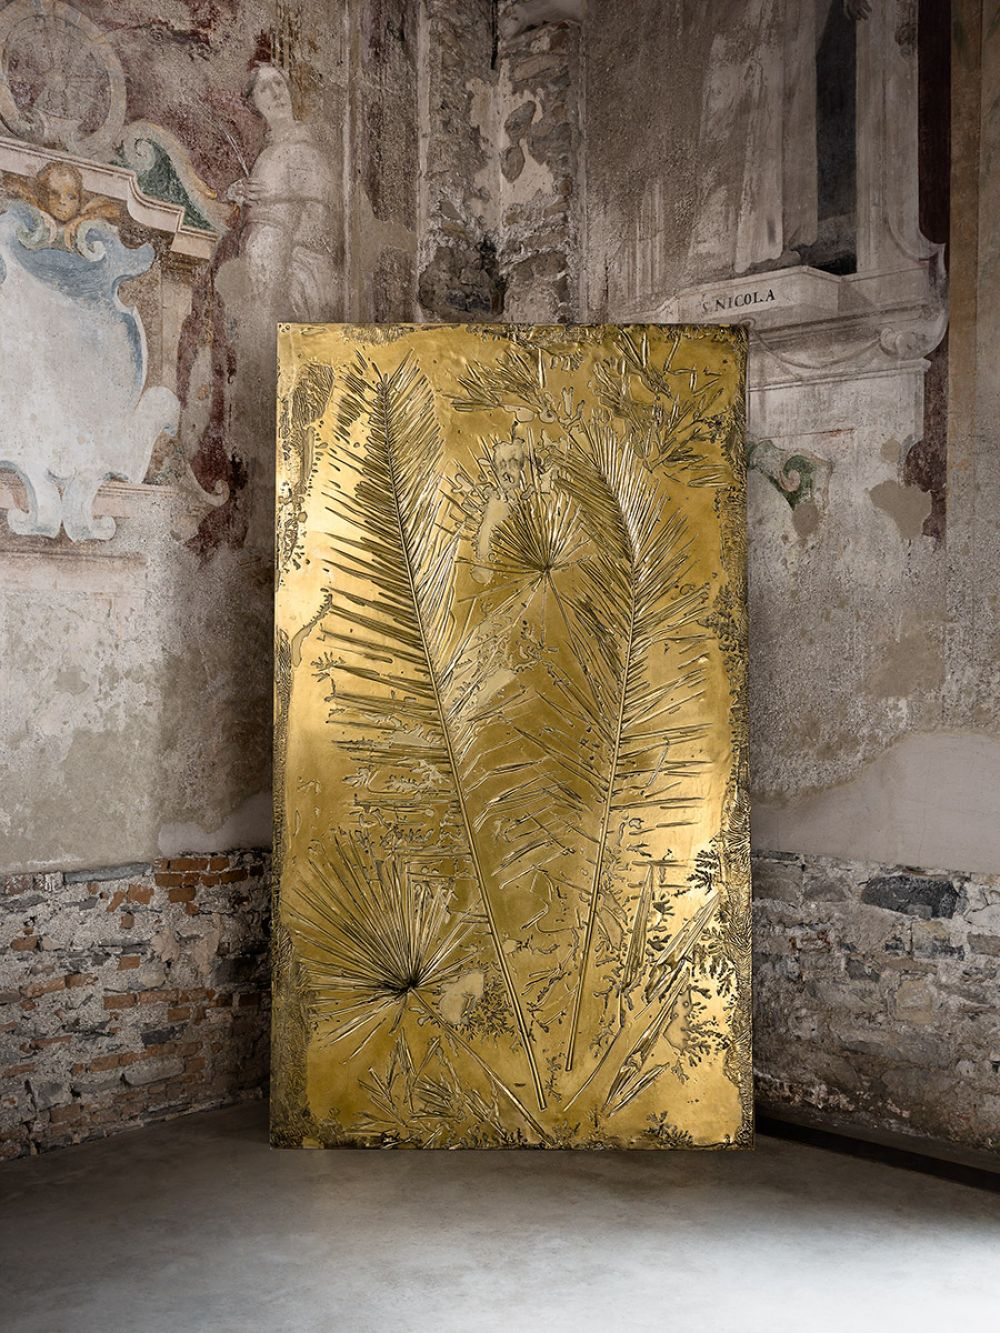 FOSSIL I - Sculptural Panel